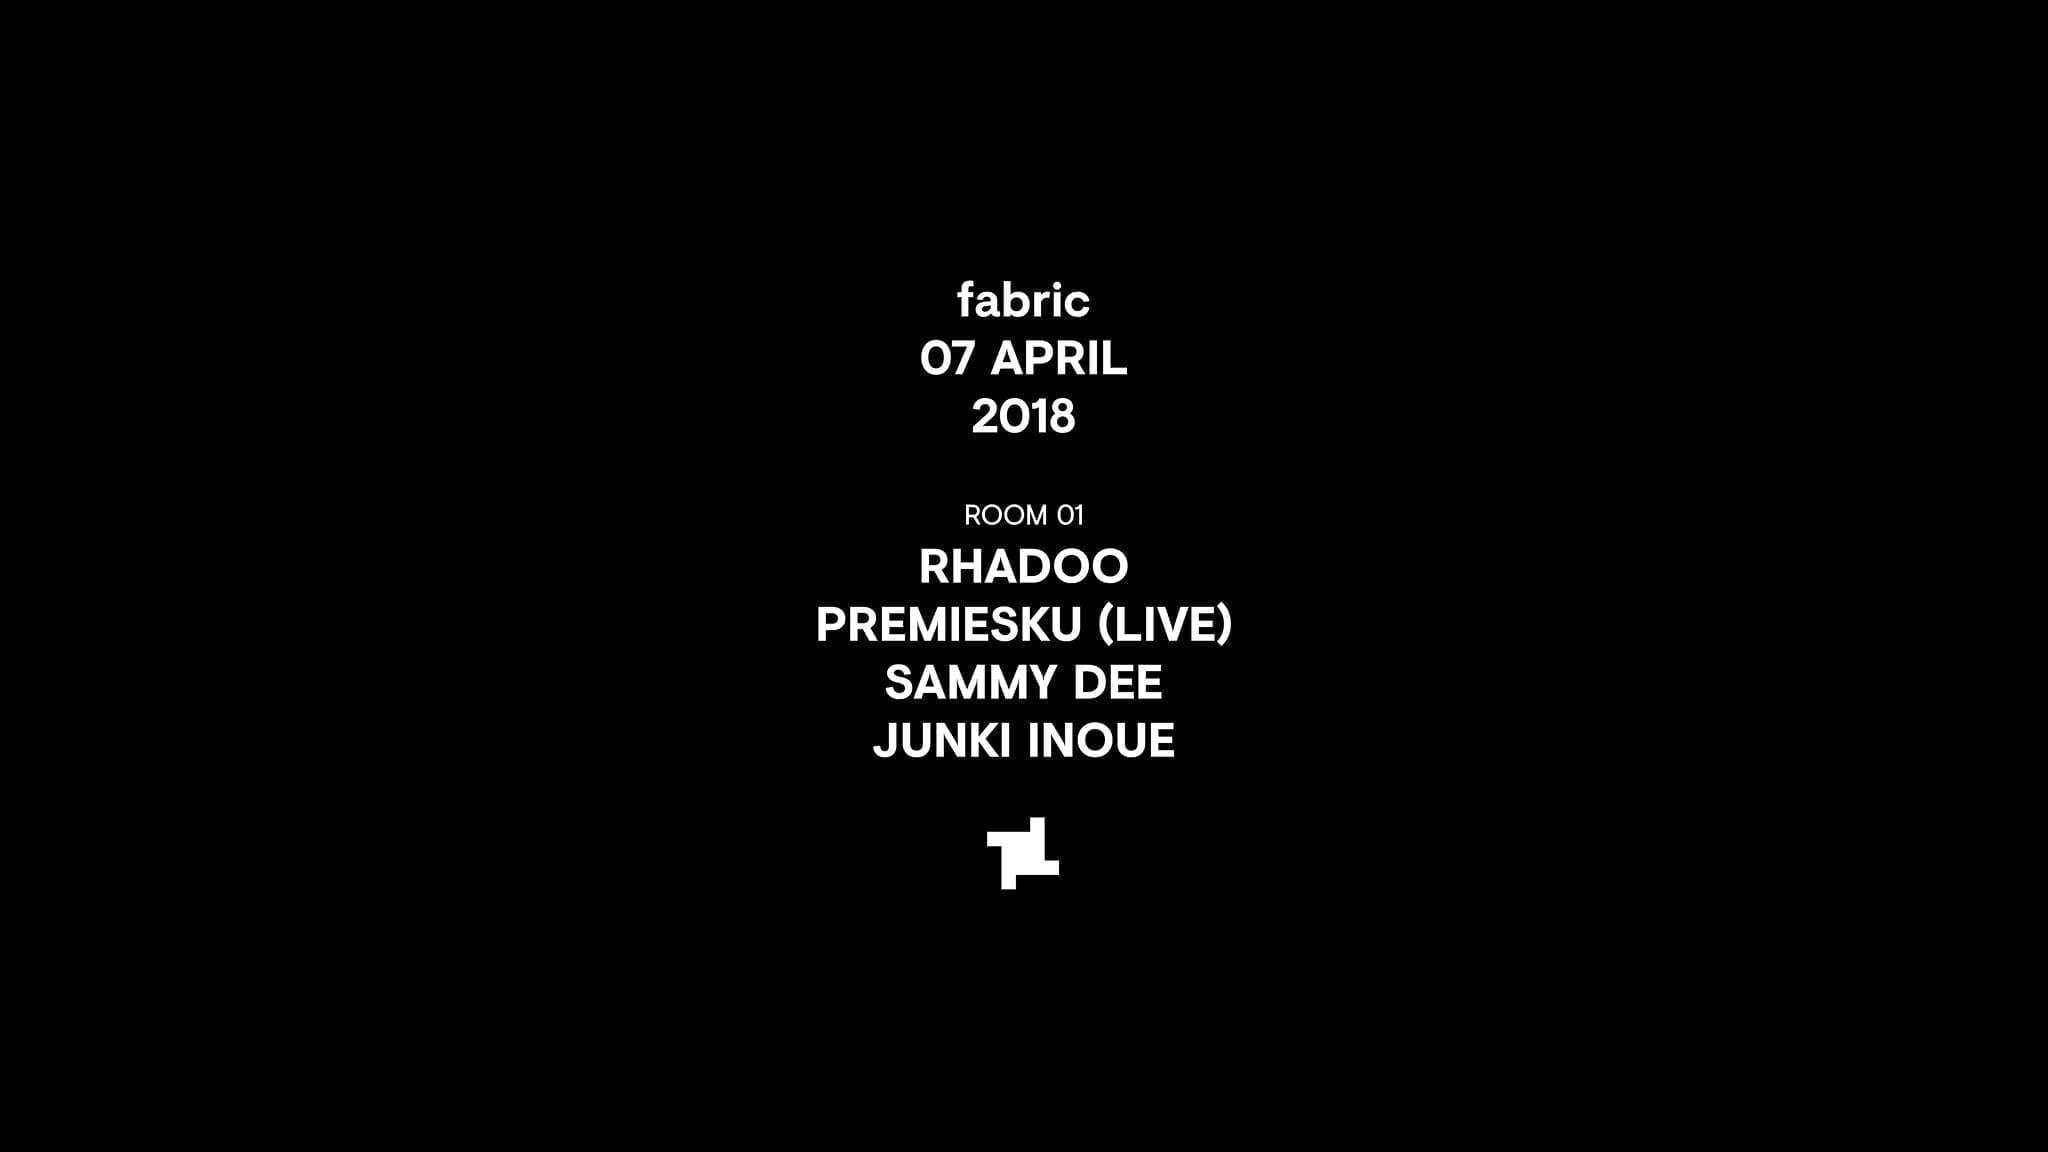 7.4 fabric: Rhadoo, Premiesku (Live), Sammy Dee & More